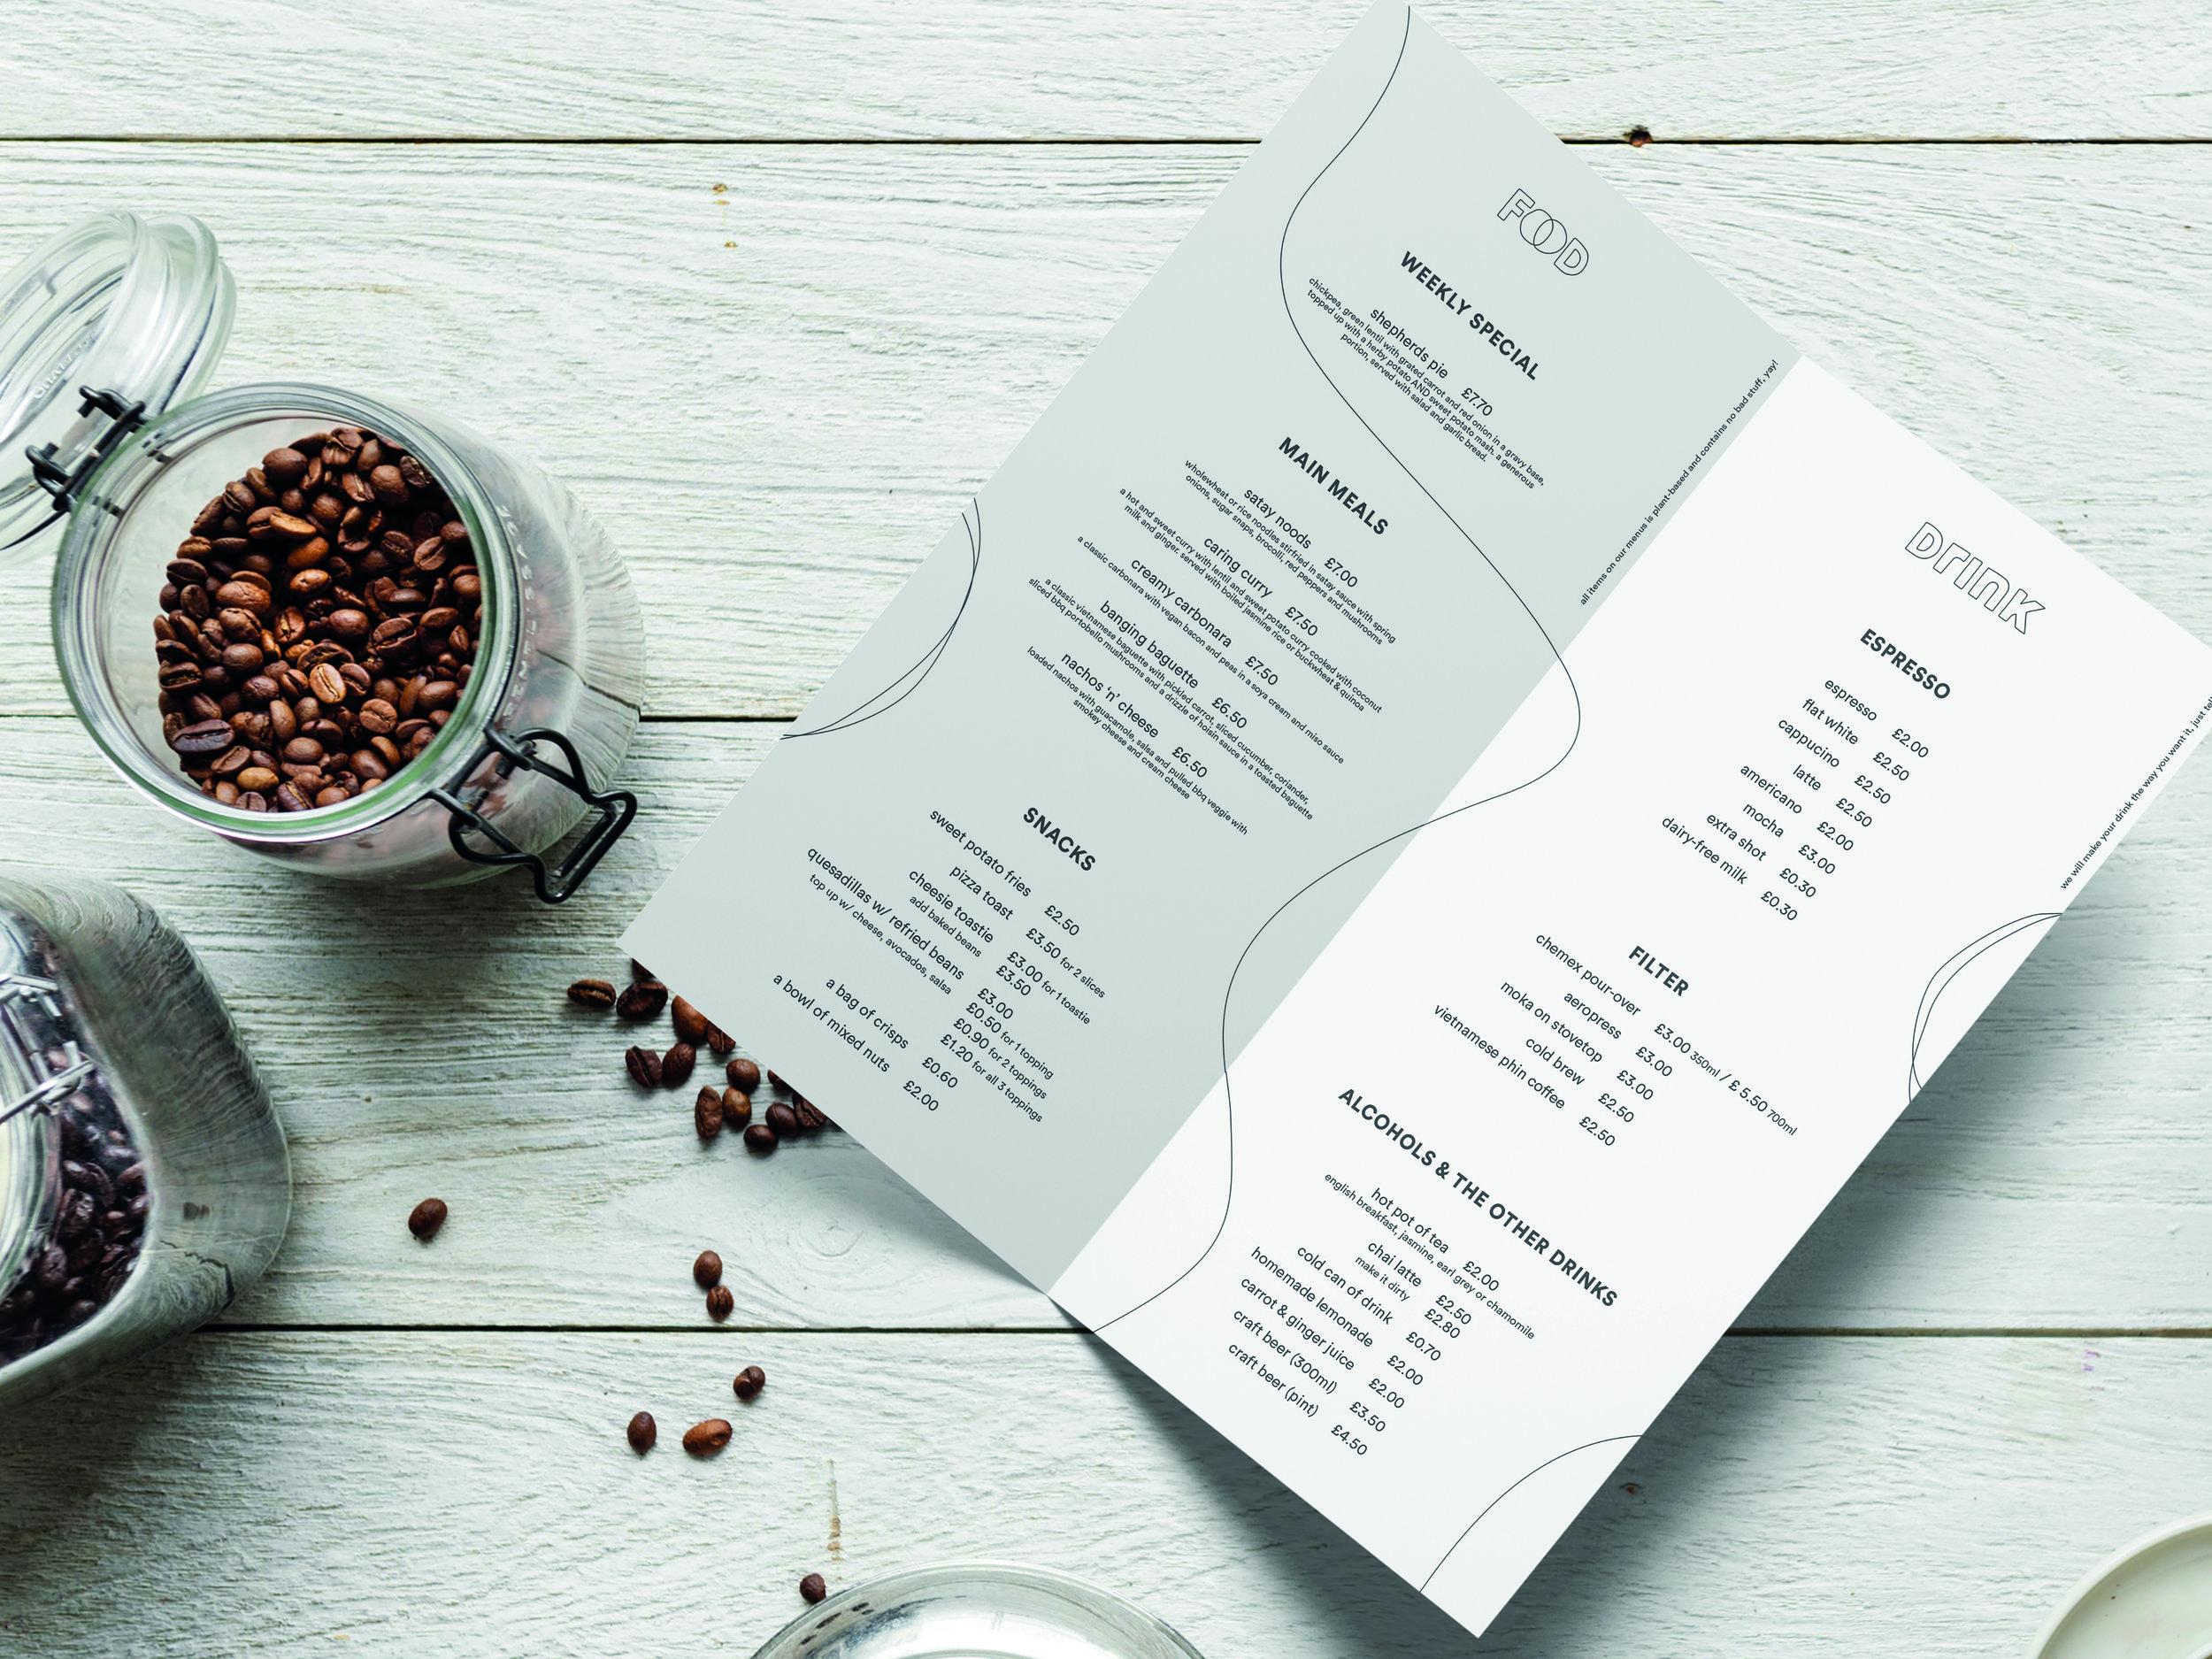 fold-menu-2 copy.jpg